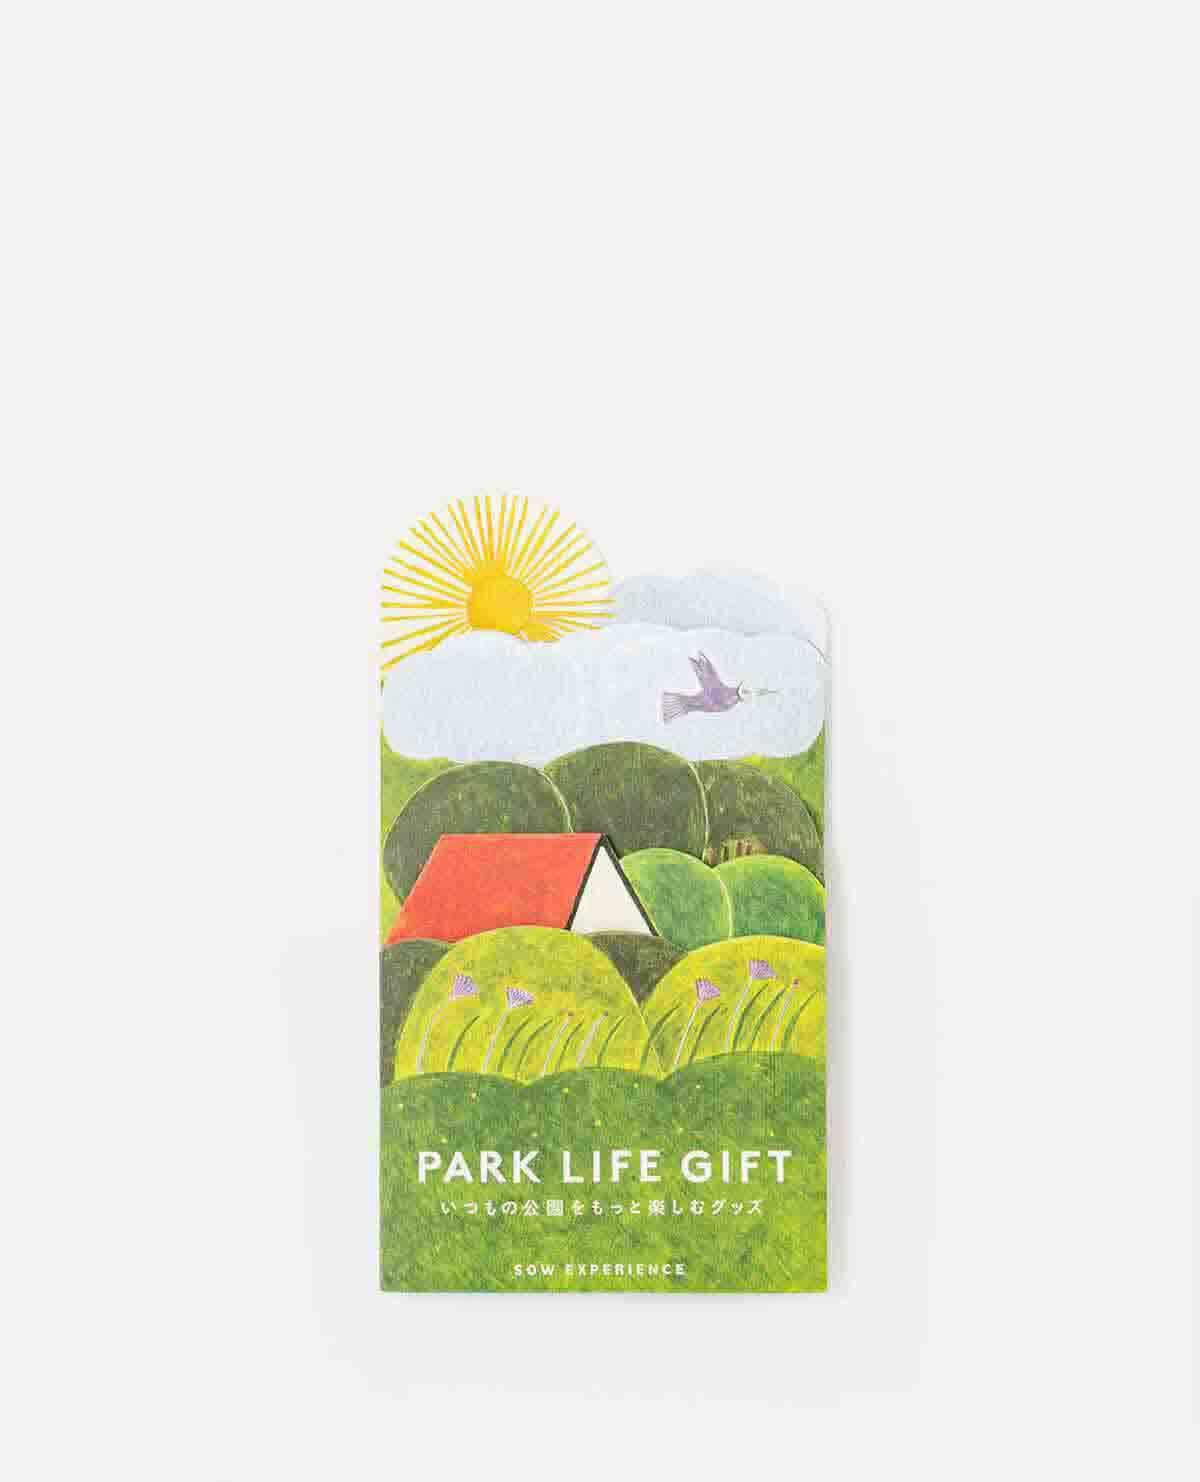 PARK LIFE GIFT